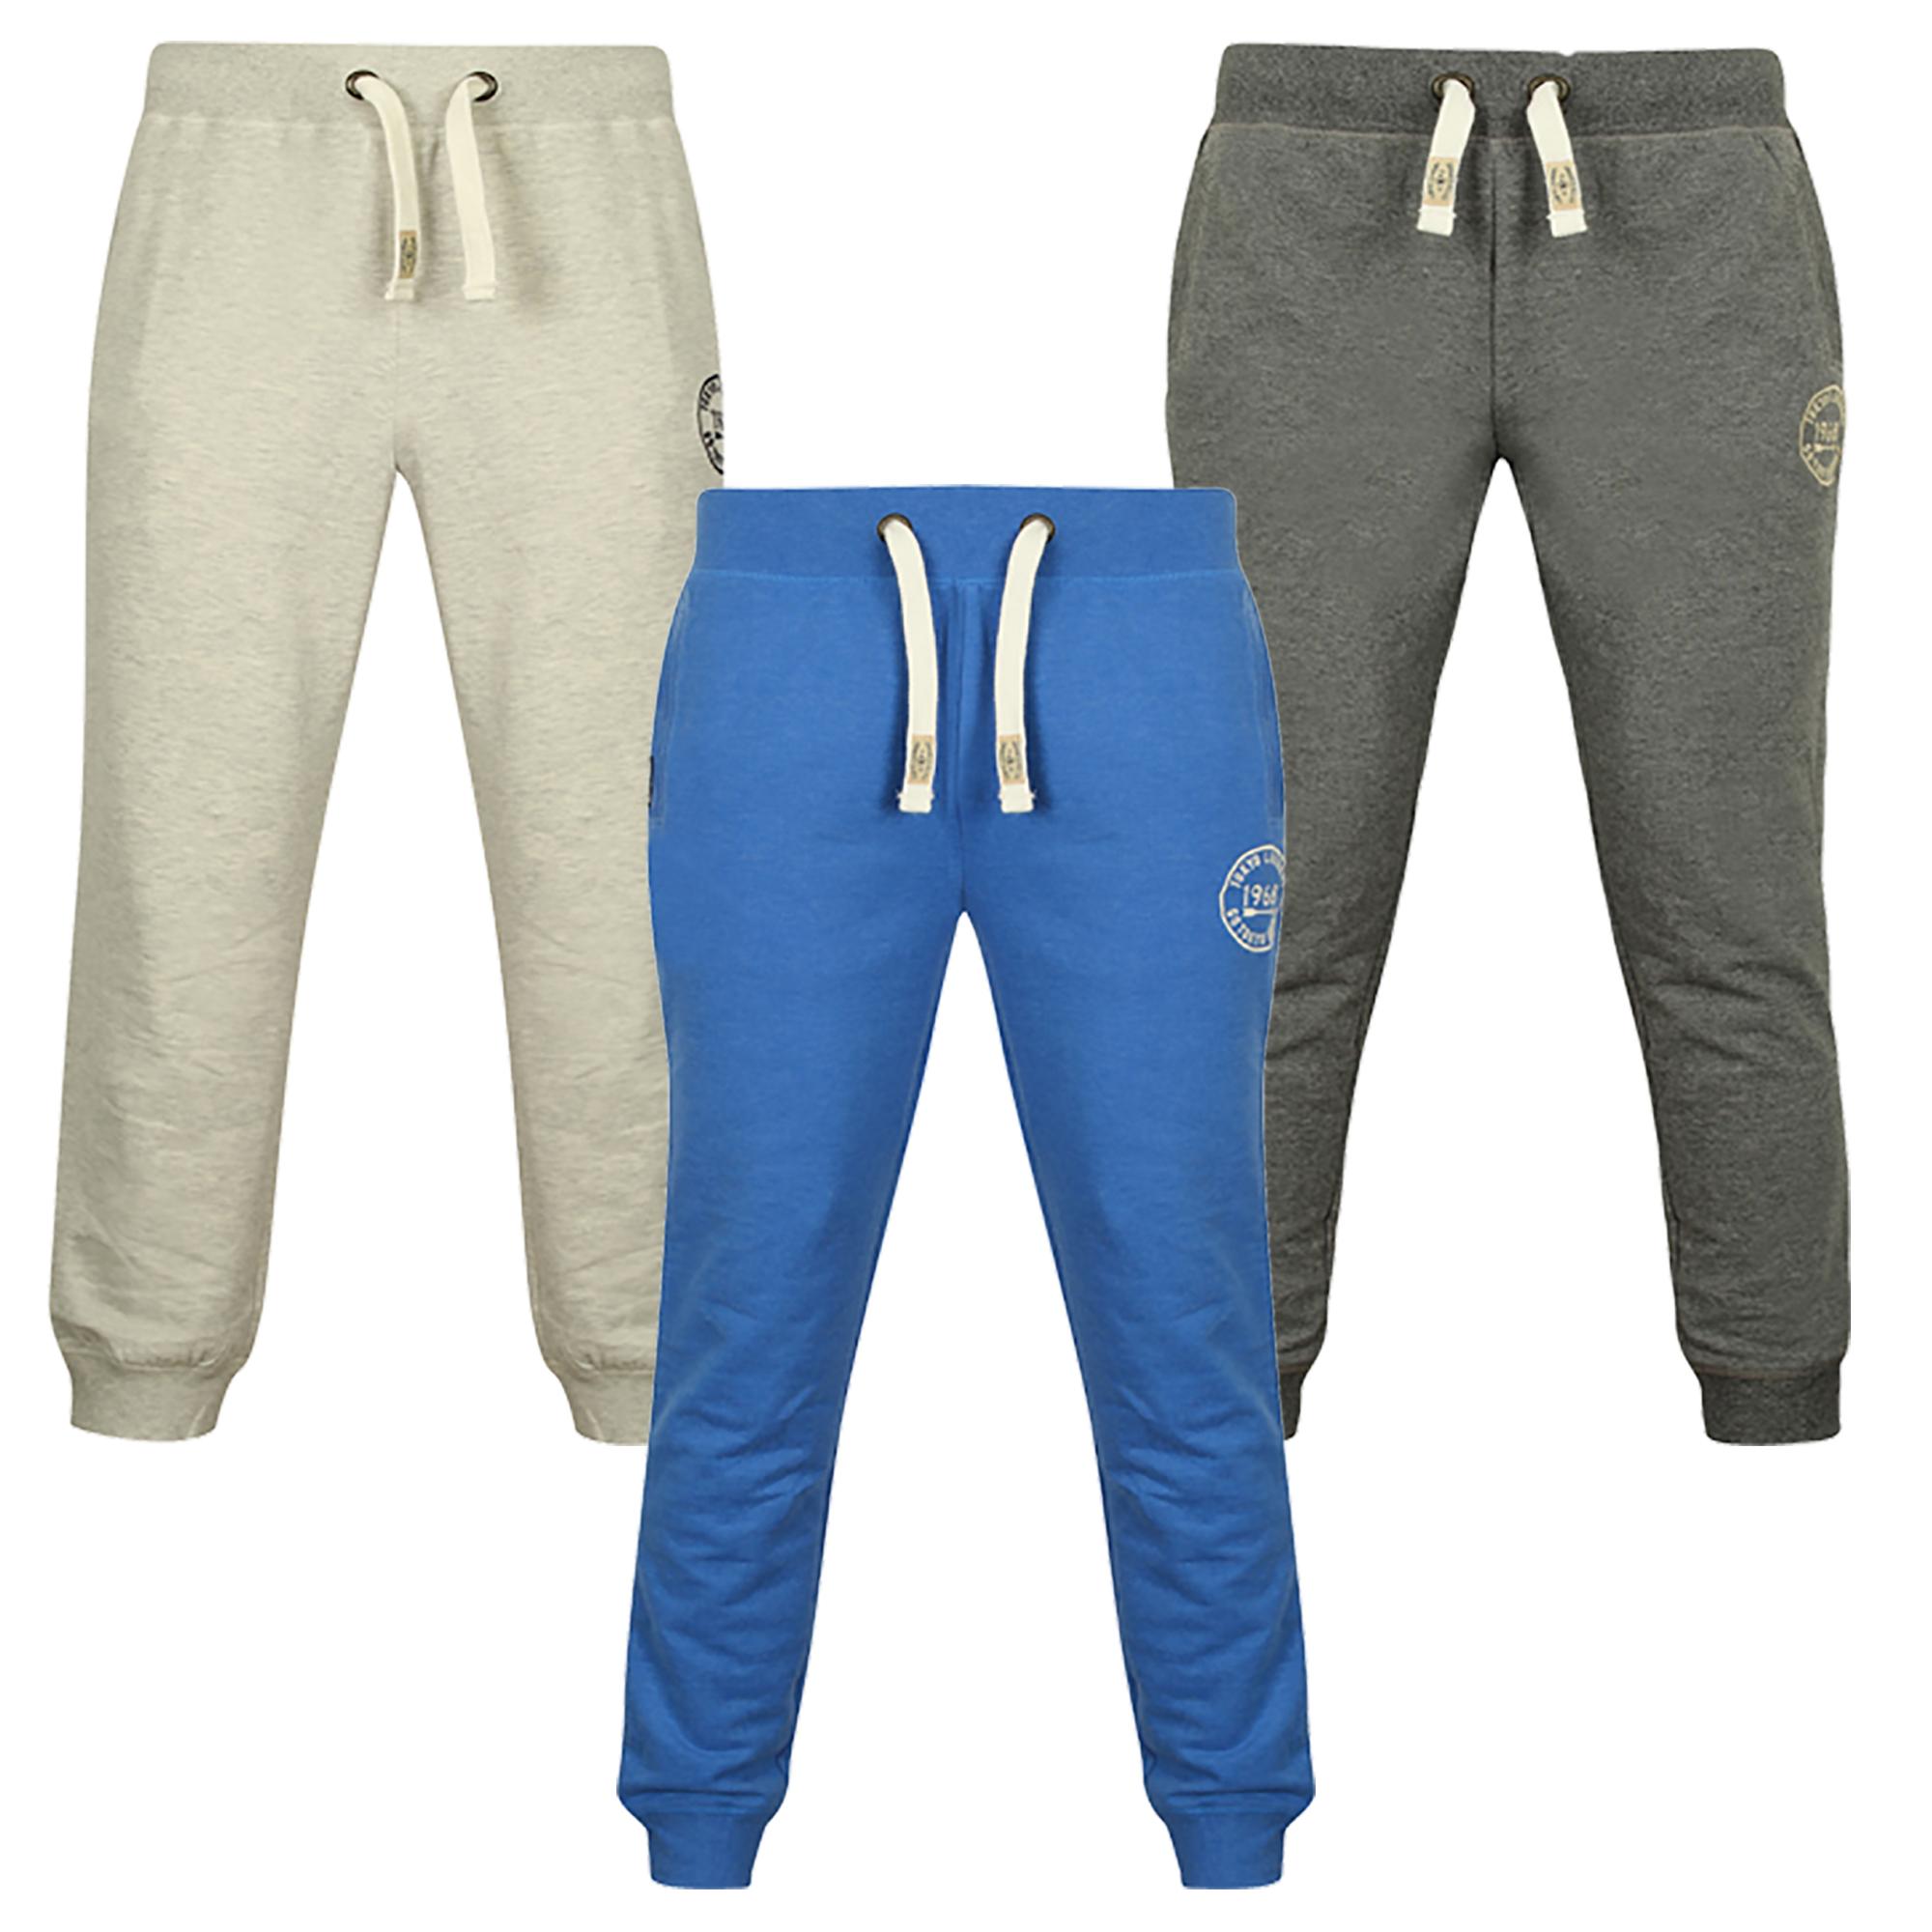 c8a5b47b7 Mens Tokyo Laundry Lynwood Sweatpants Joggers Jogging Pants ...